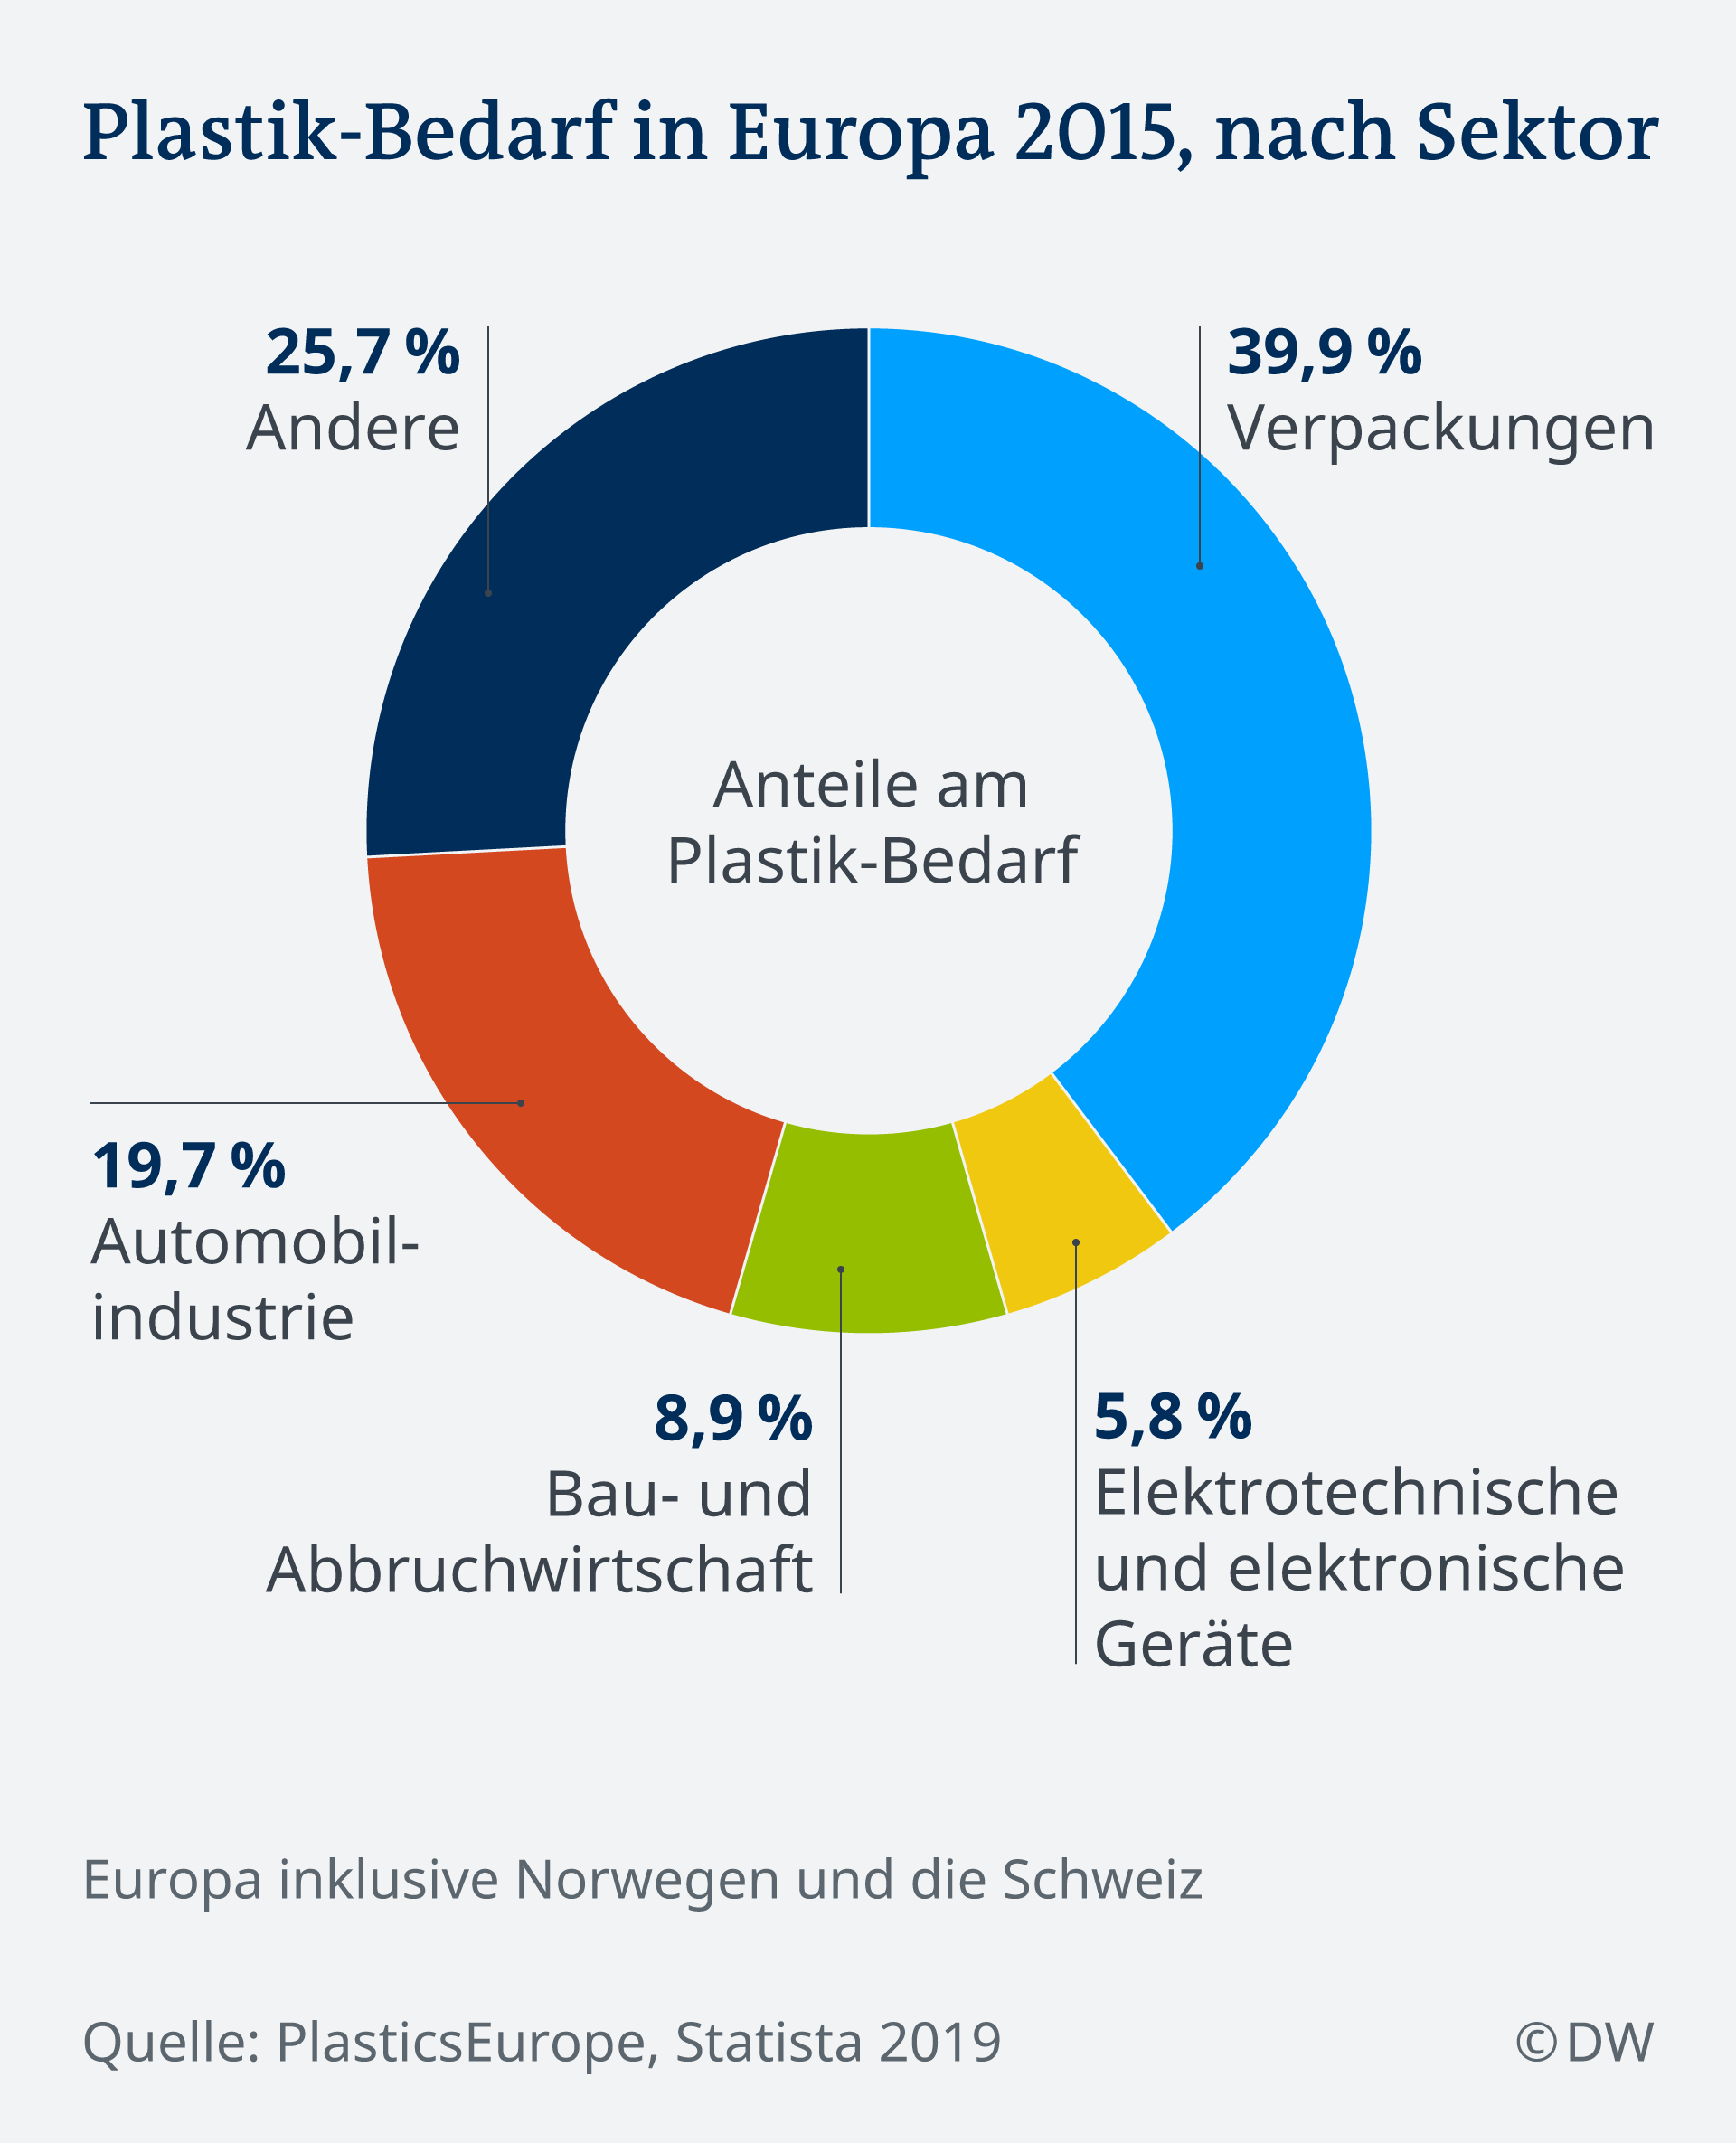 Infografik Plastik-Bedarf in Europa aufgelistet nach Sektor, 2015